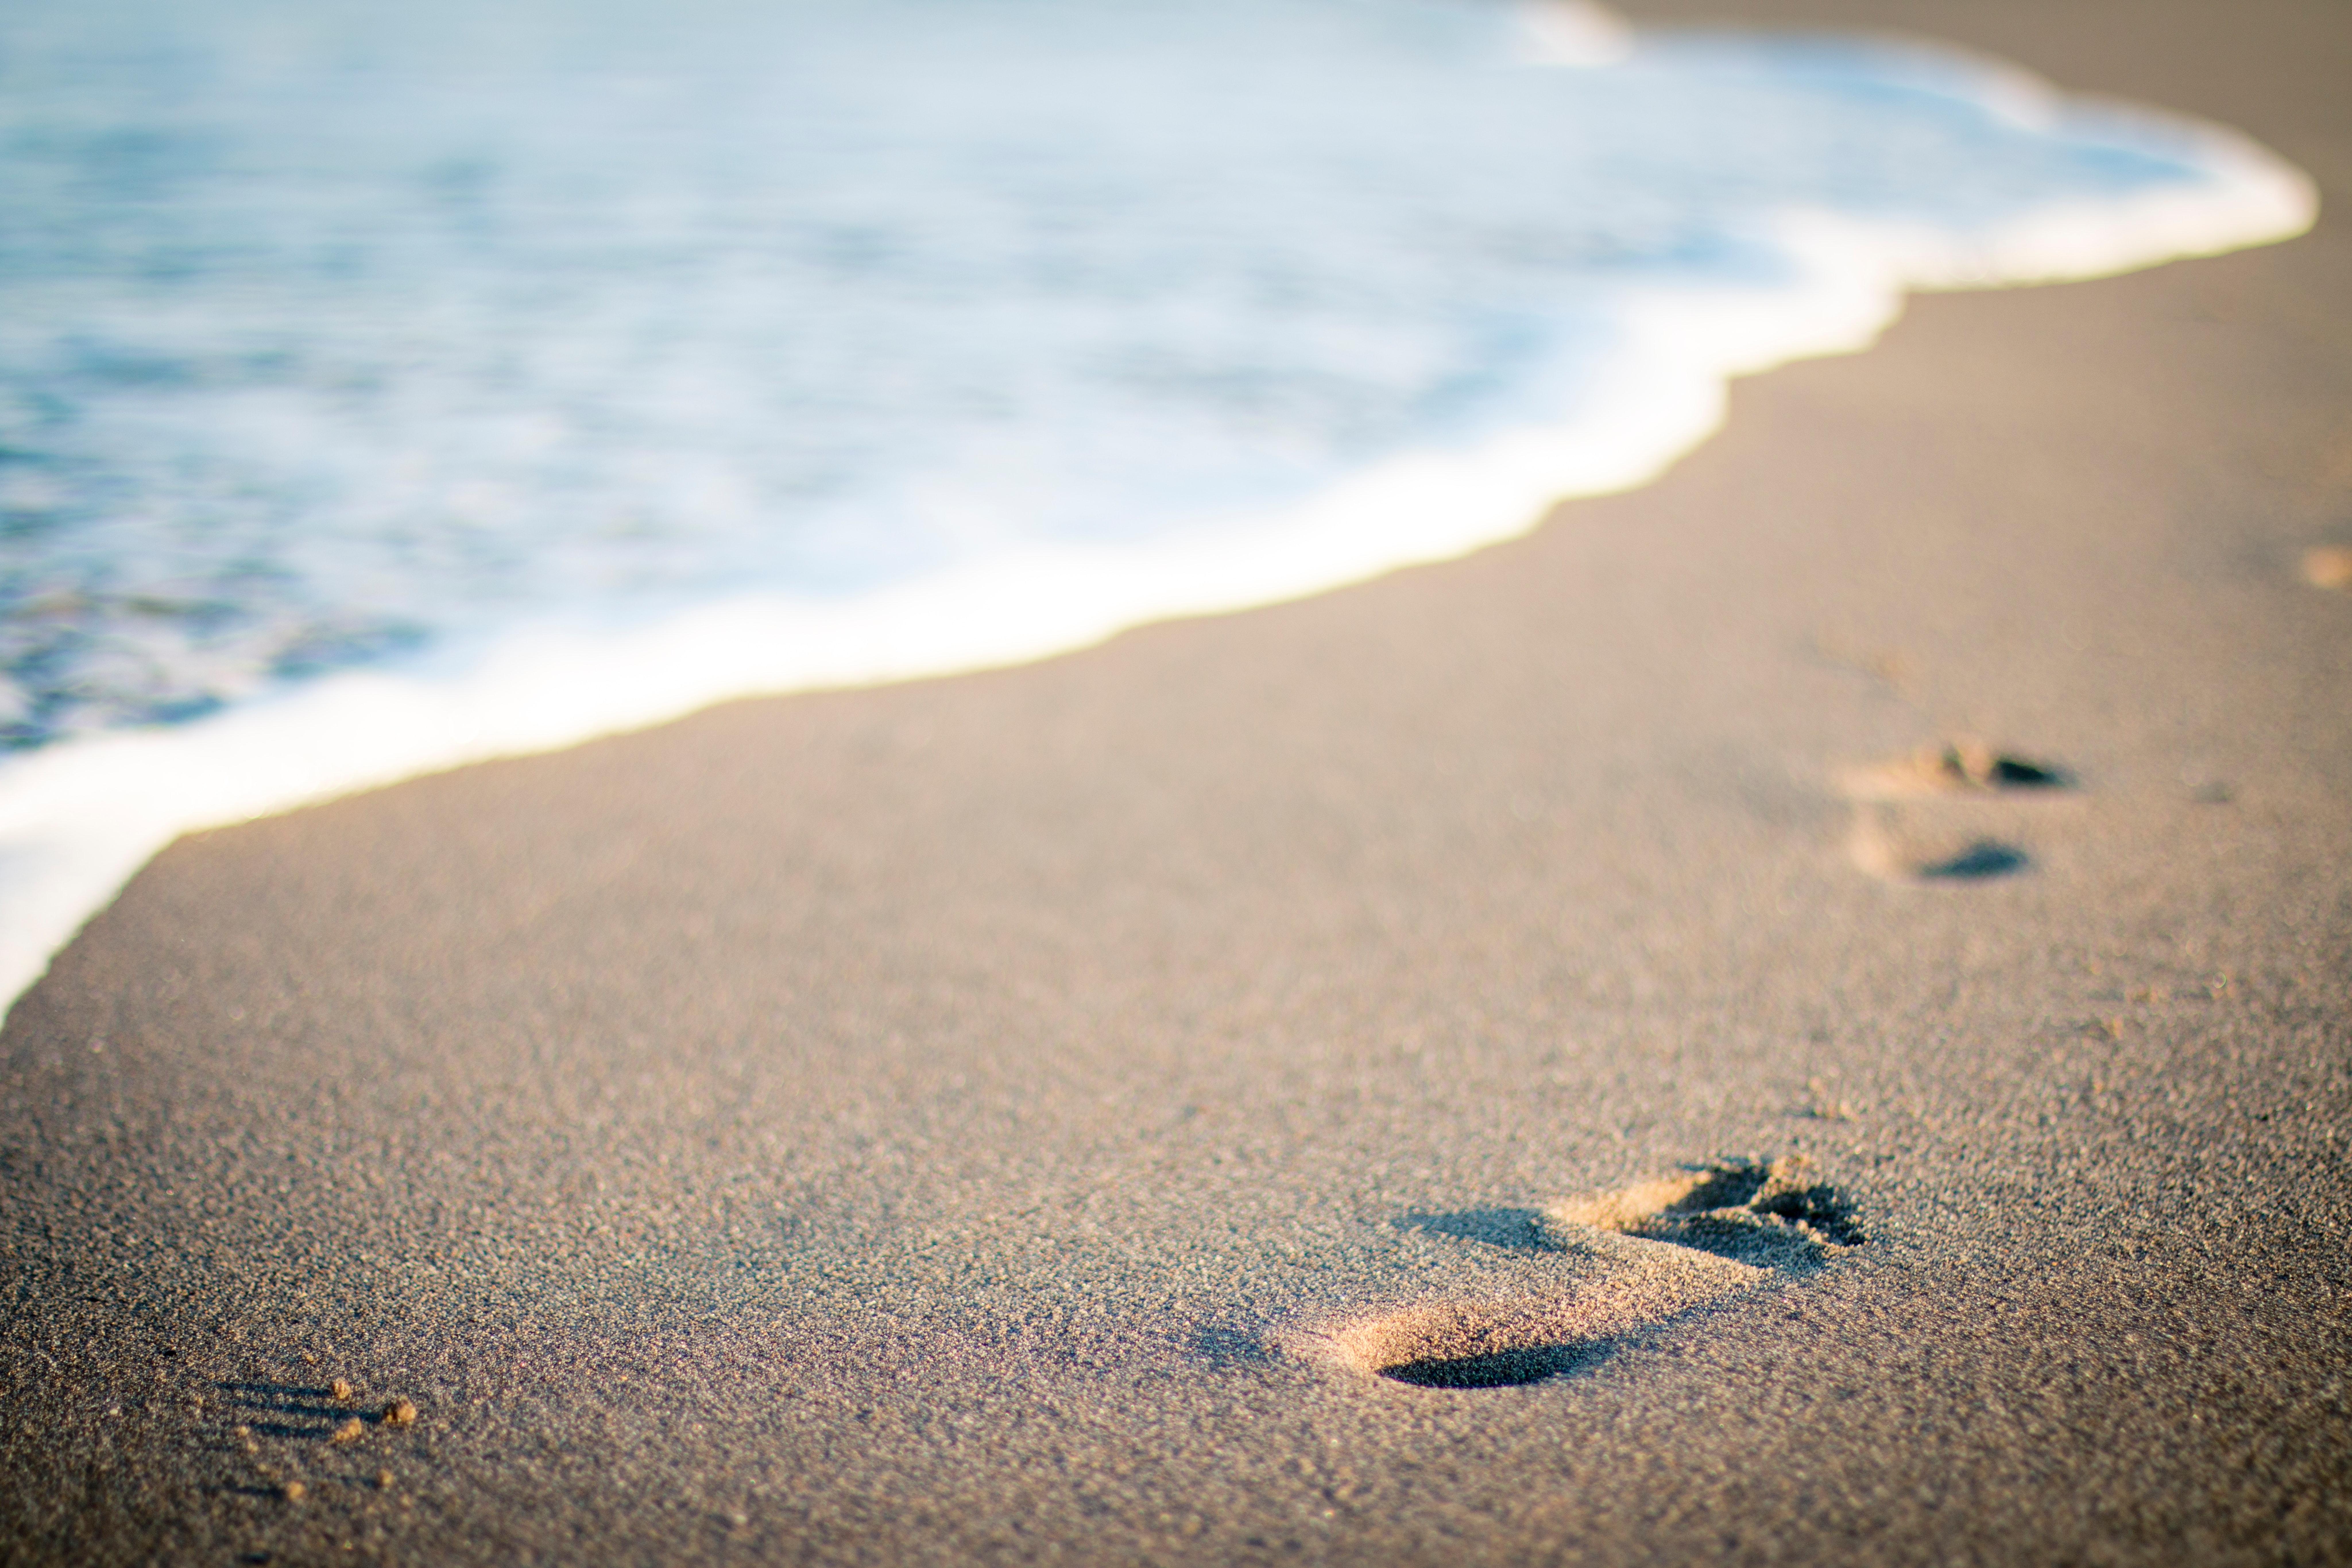 f6153a9401d48 Footprints in Beach · Free Stock Photo